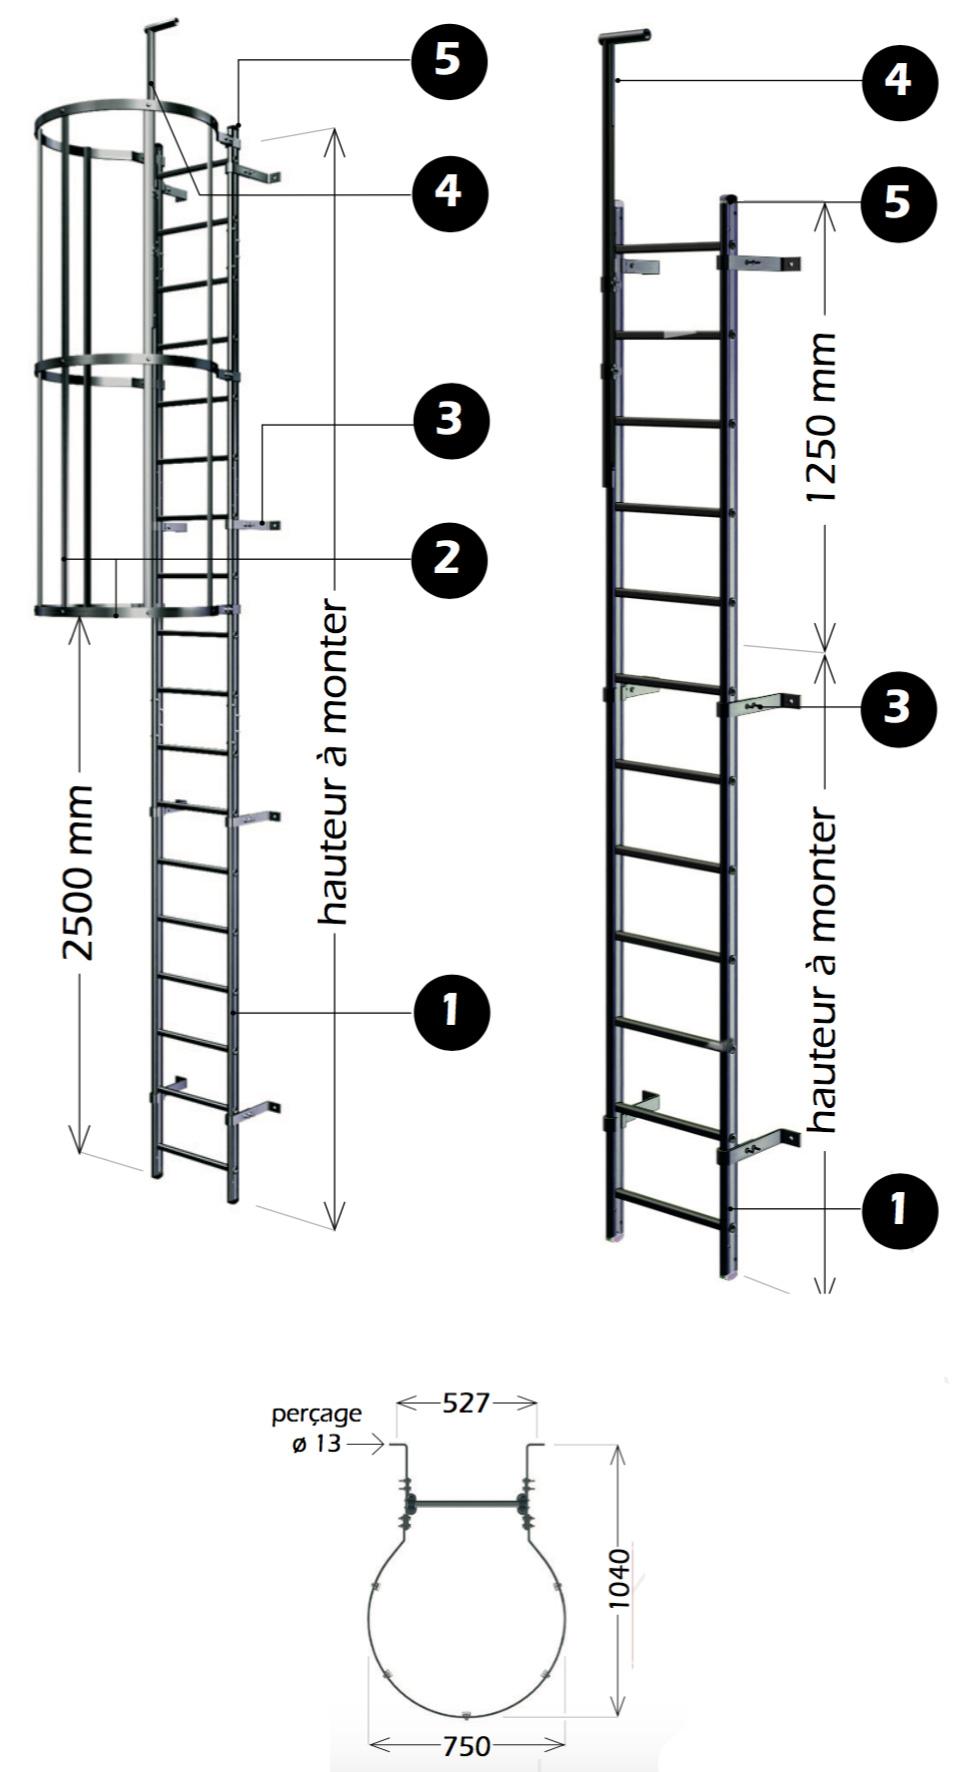 100 fauteuil roulant dwg plan moderne electricite. Black Bedroom Furniture Sets. Home Design Ideas